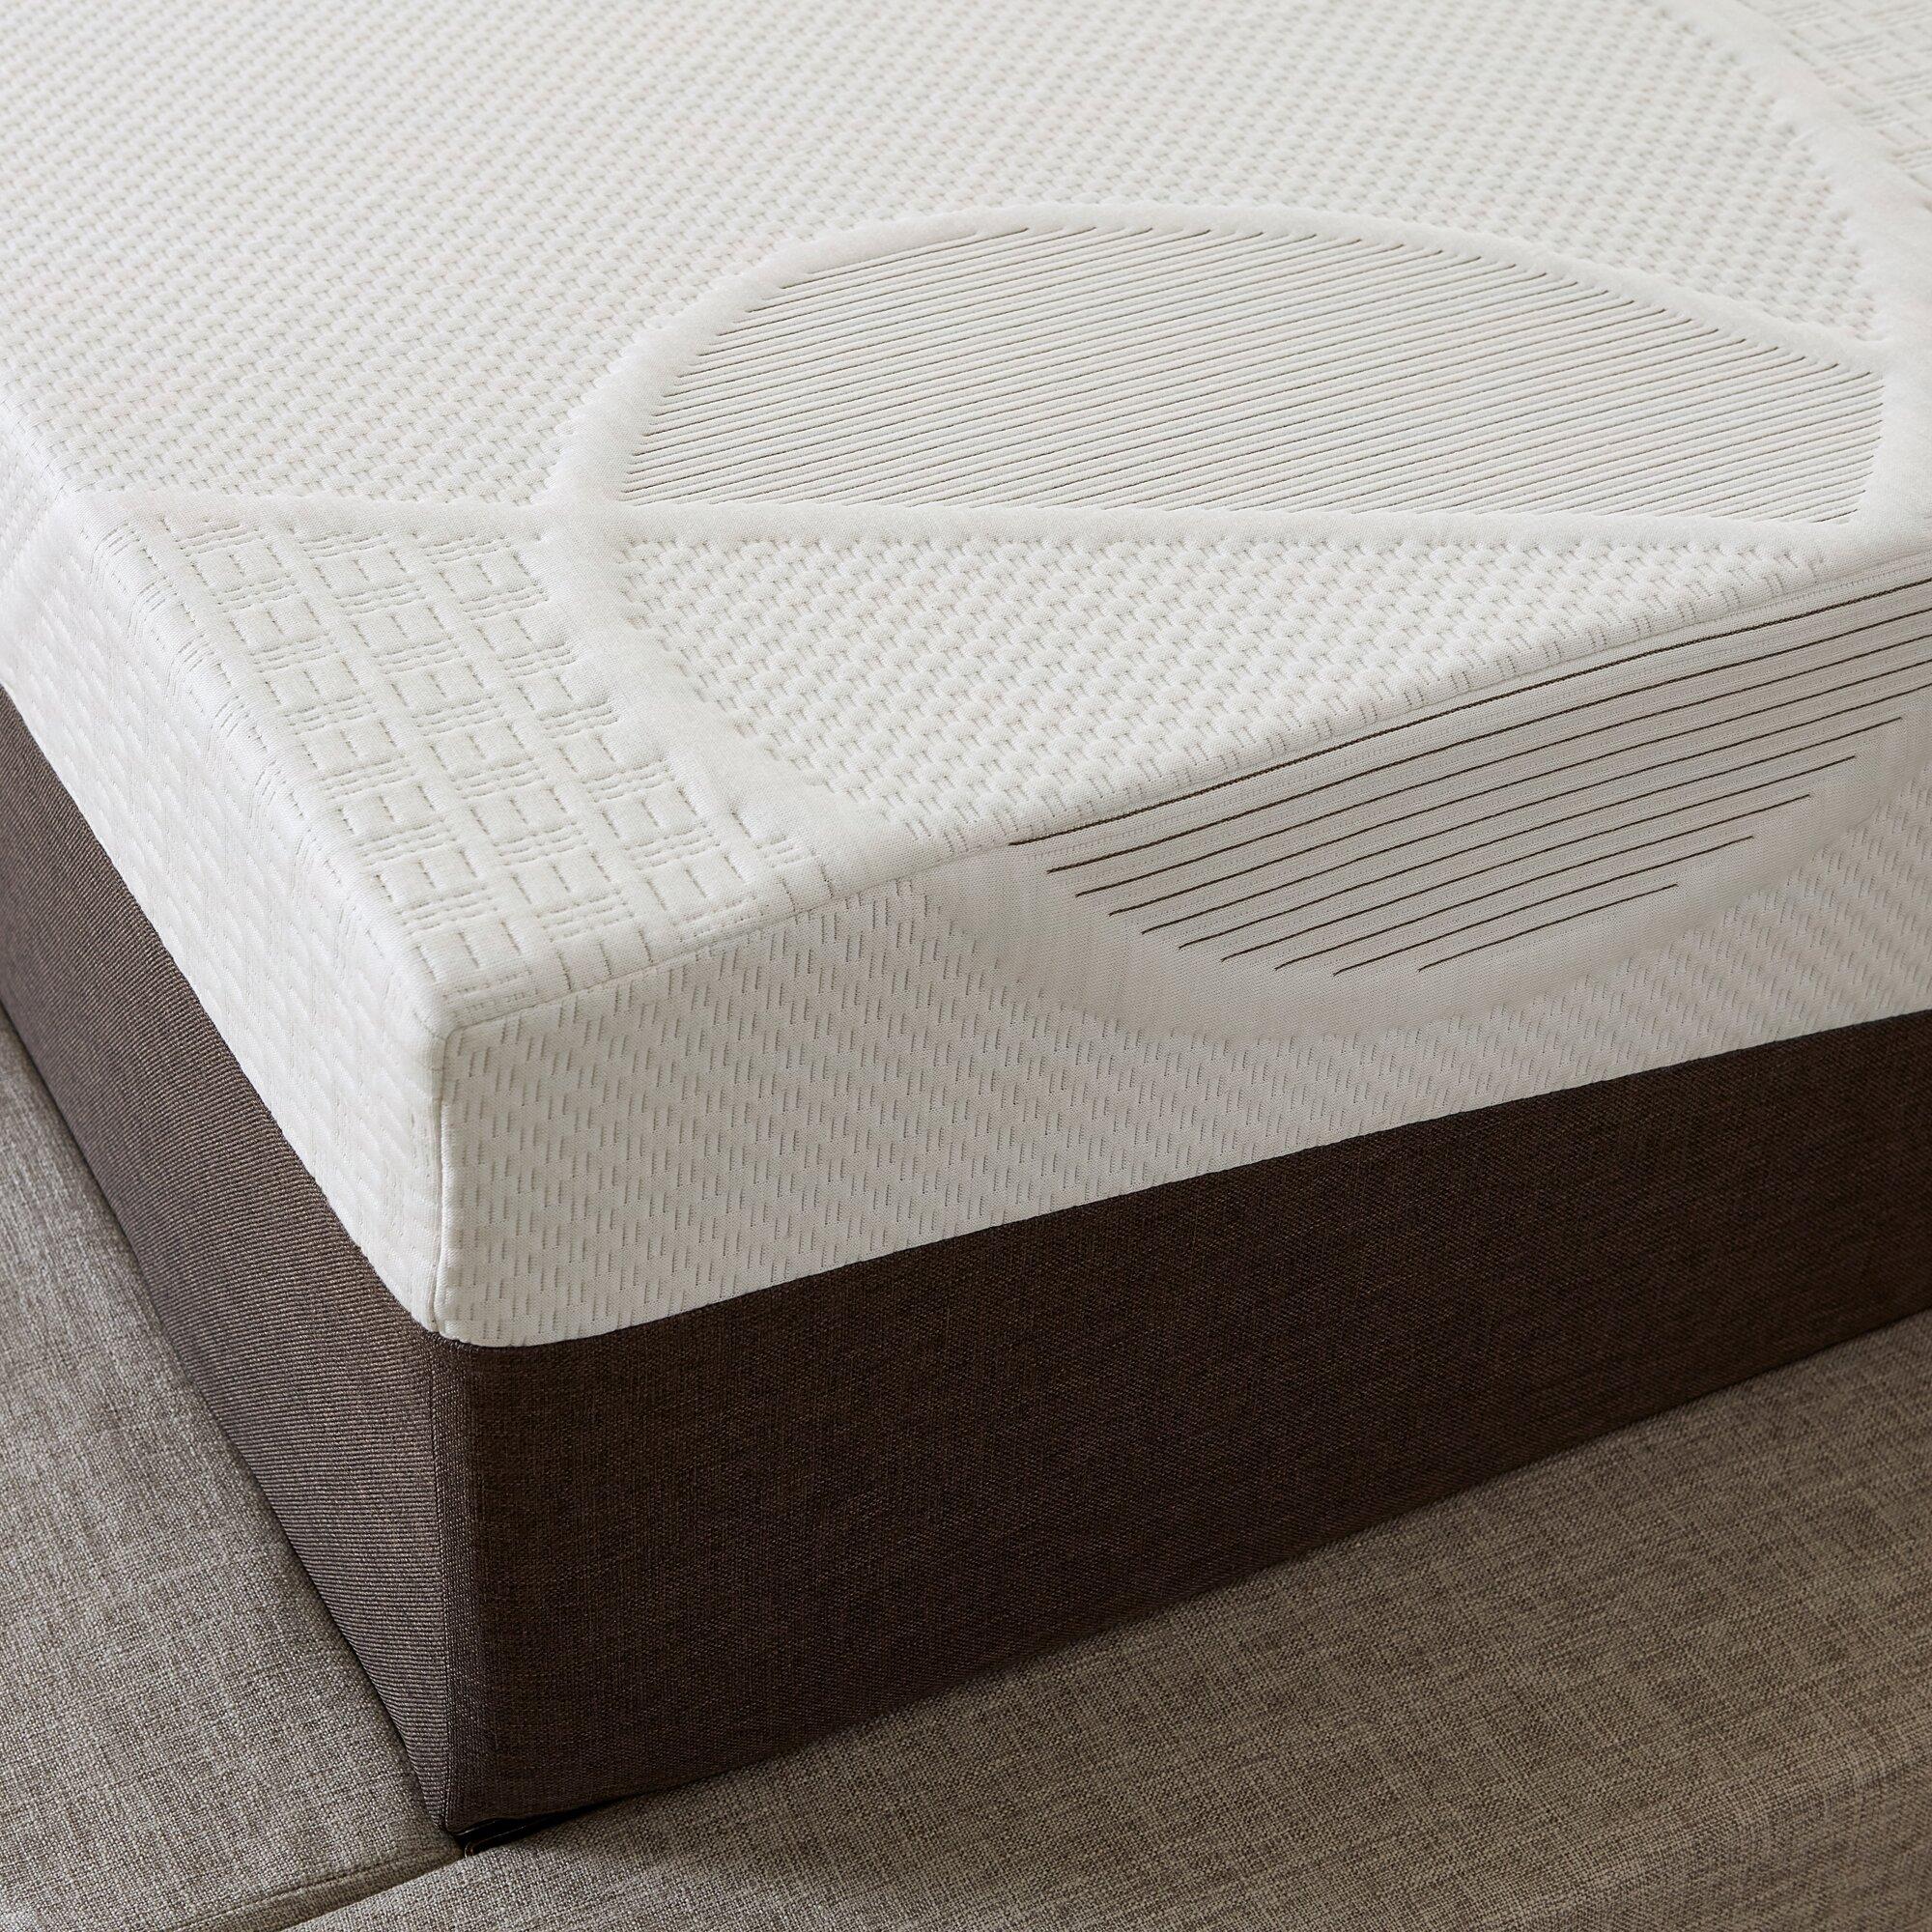 Anew Edit 14 Firm Gel Memory Foam Mattress